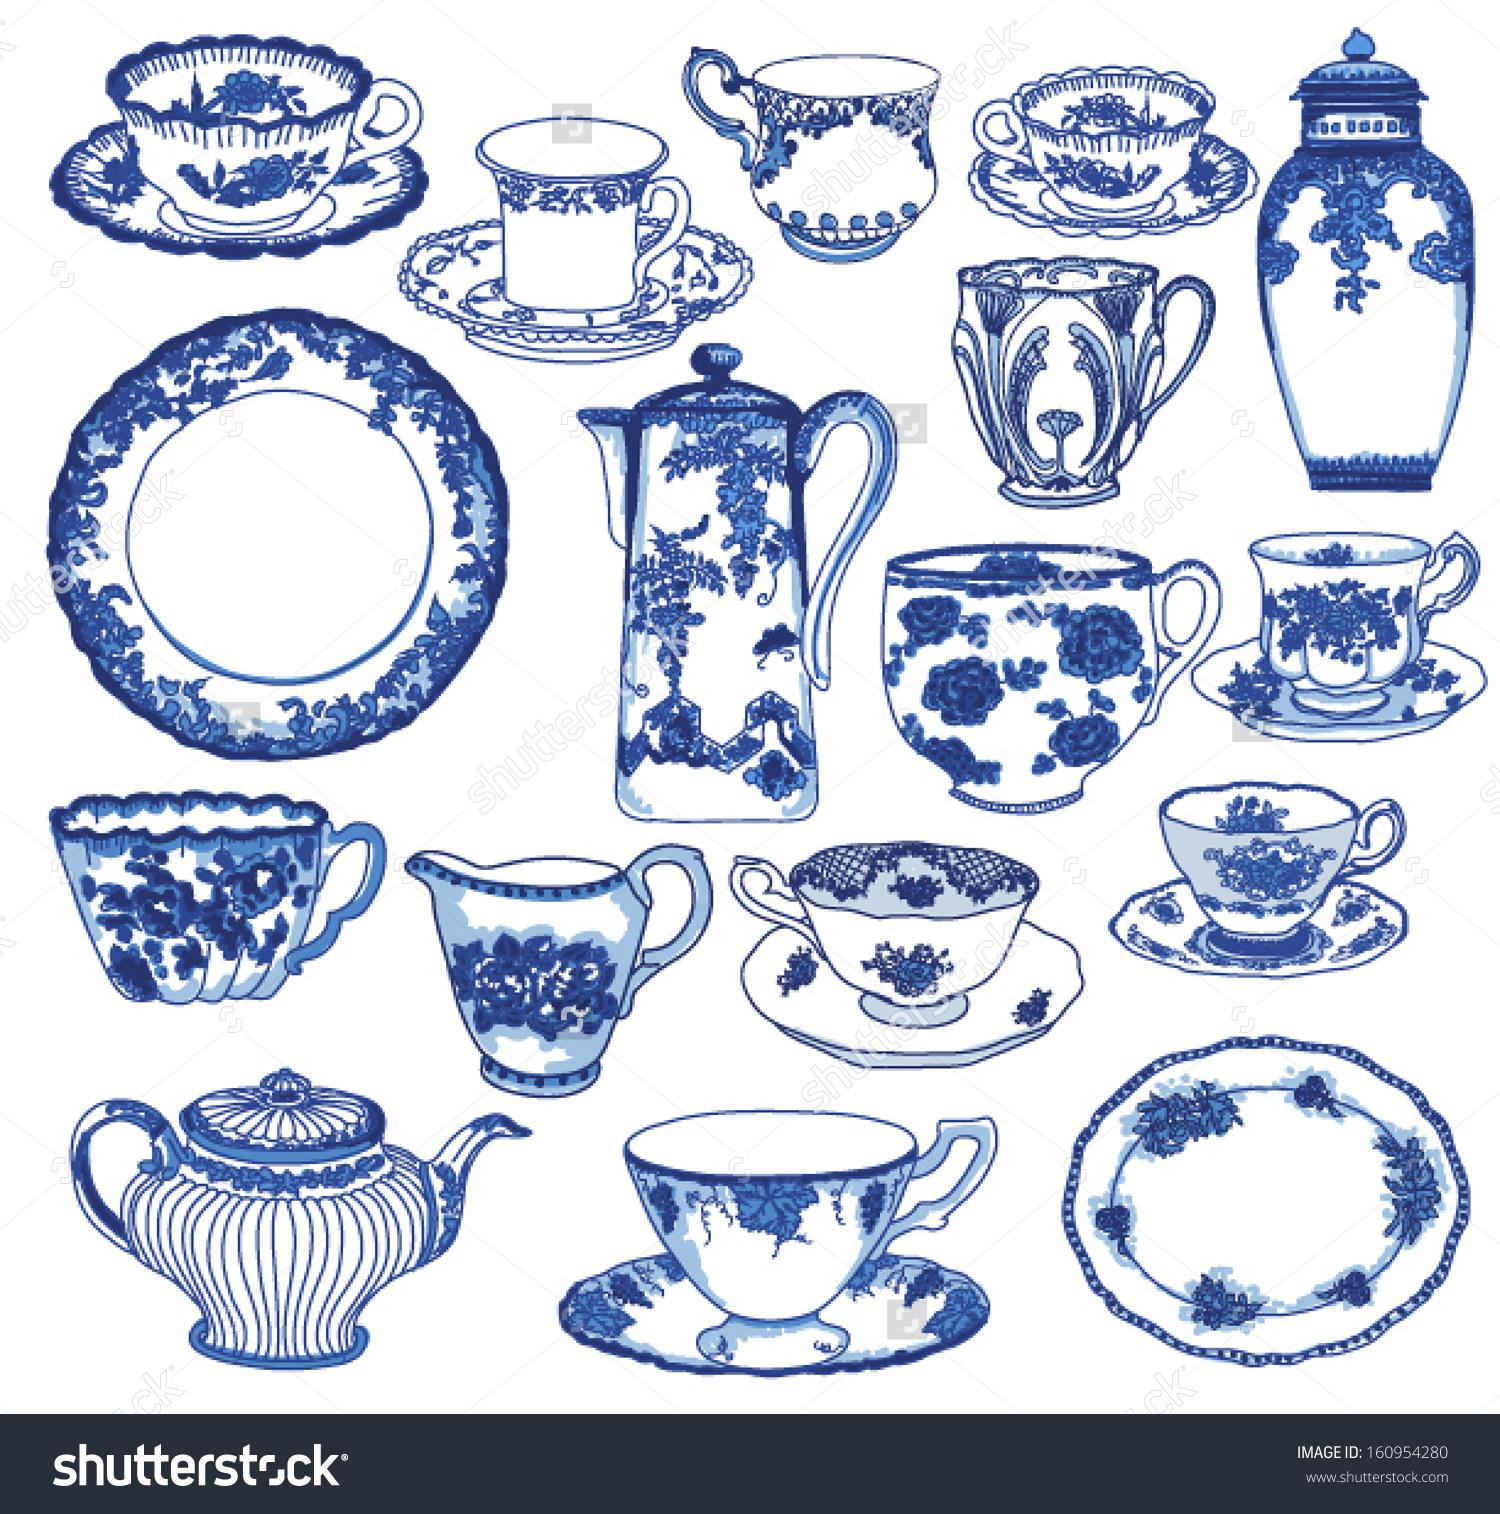 Fine China Set Hand Drawn Porcelain Stock Vector 160954280.